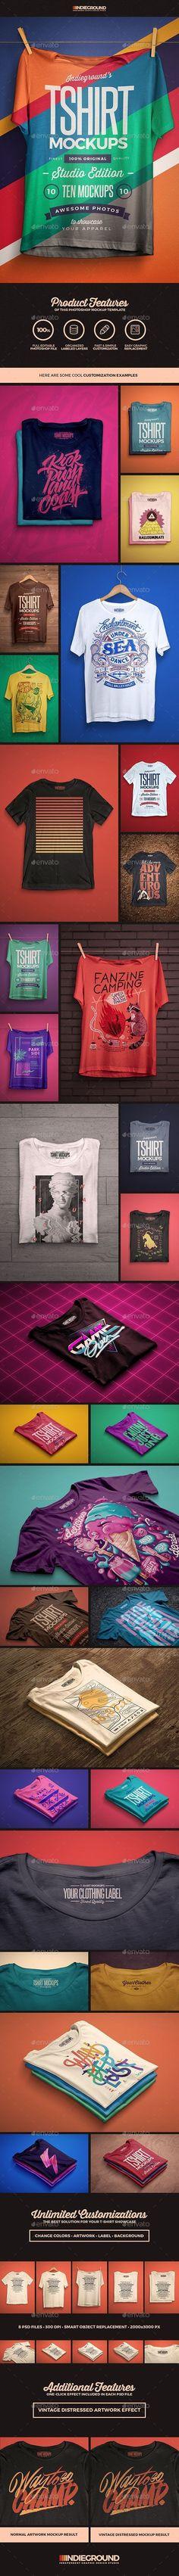 Studio T-shirt Mockups #apparelmockup